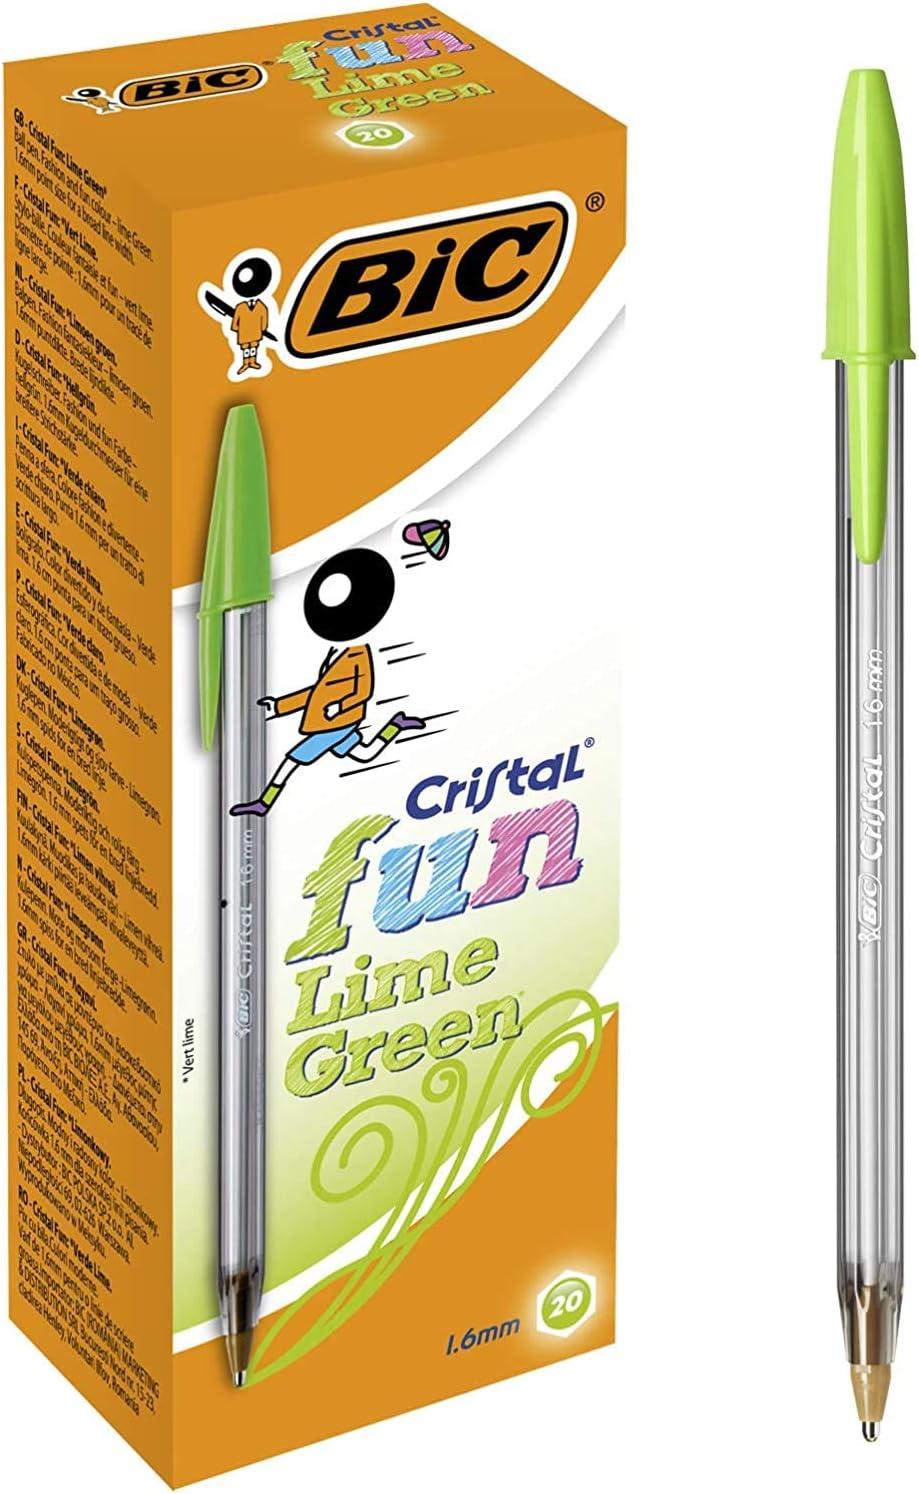 BIC Cristal Fun bolígrafos Punta Ancha (1,6 mm) – Verde Lima, Caja ...